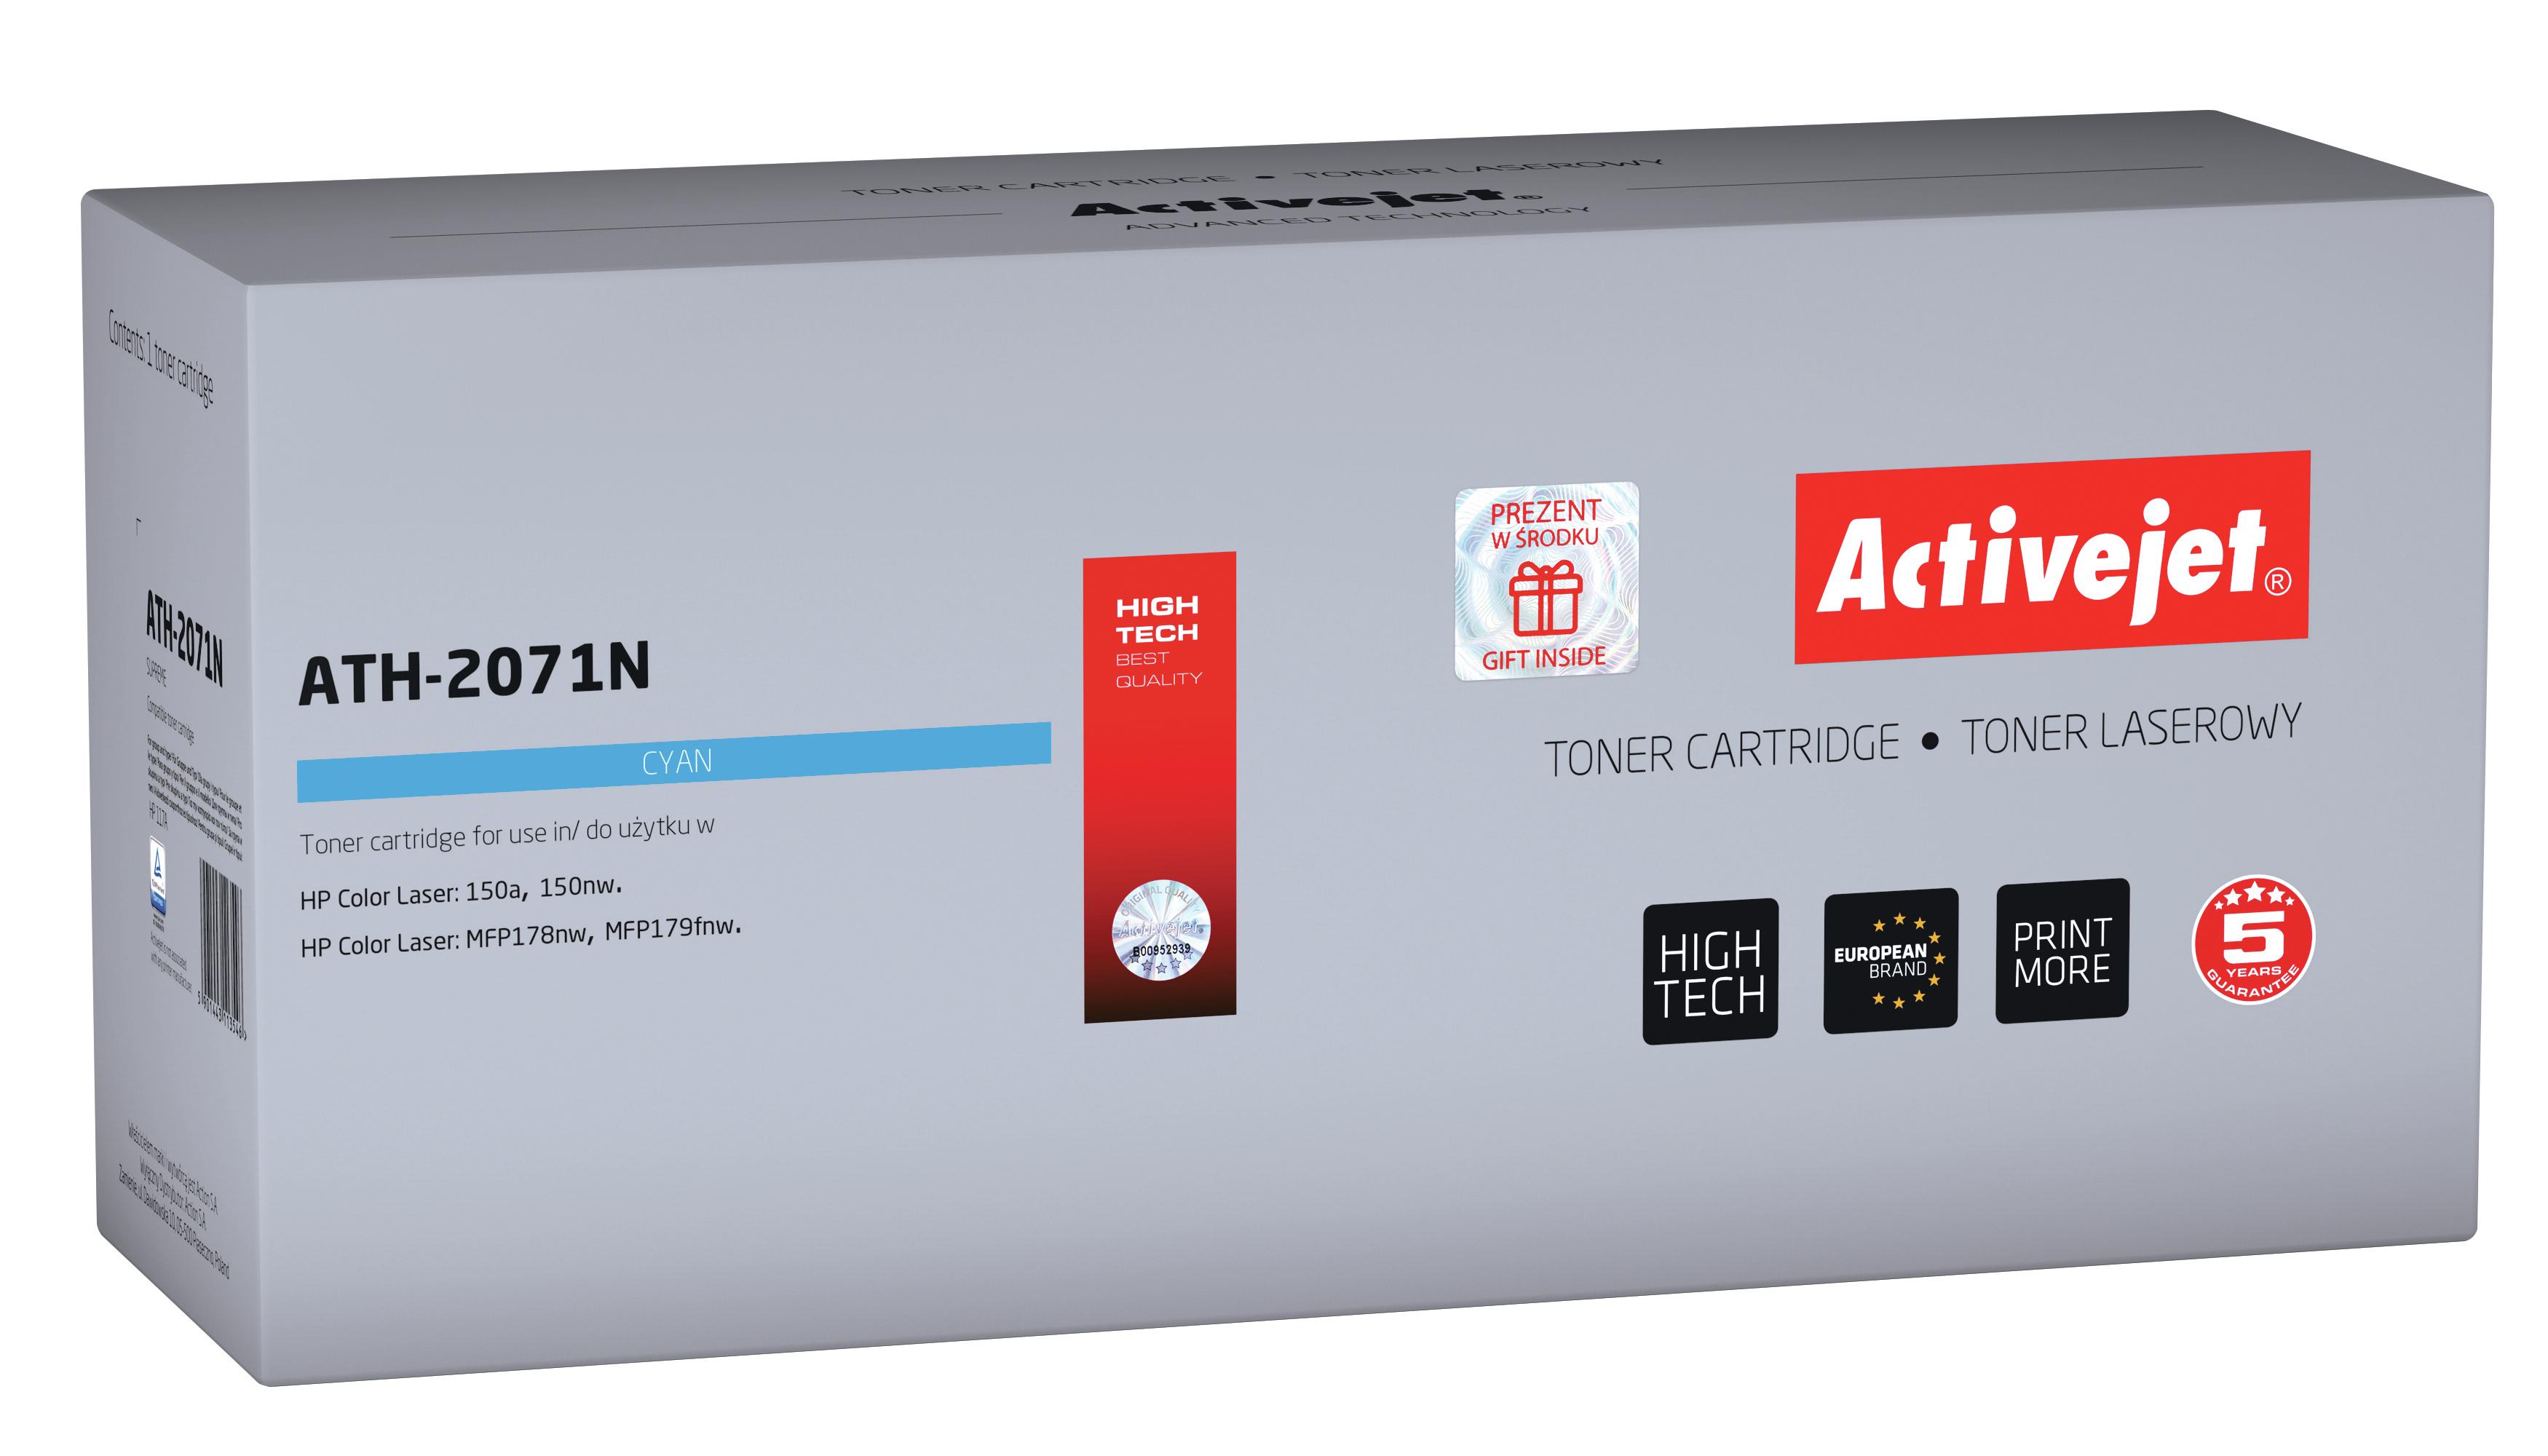 Toner Activejet ATH-2071N do drukarek HP, Zamiennik HP 117A 2071A; supreme; 700 stron; błękitny.